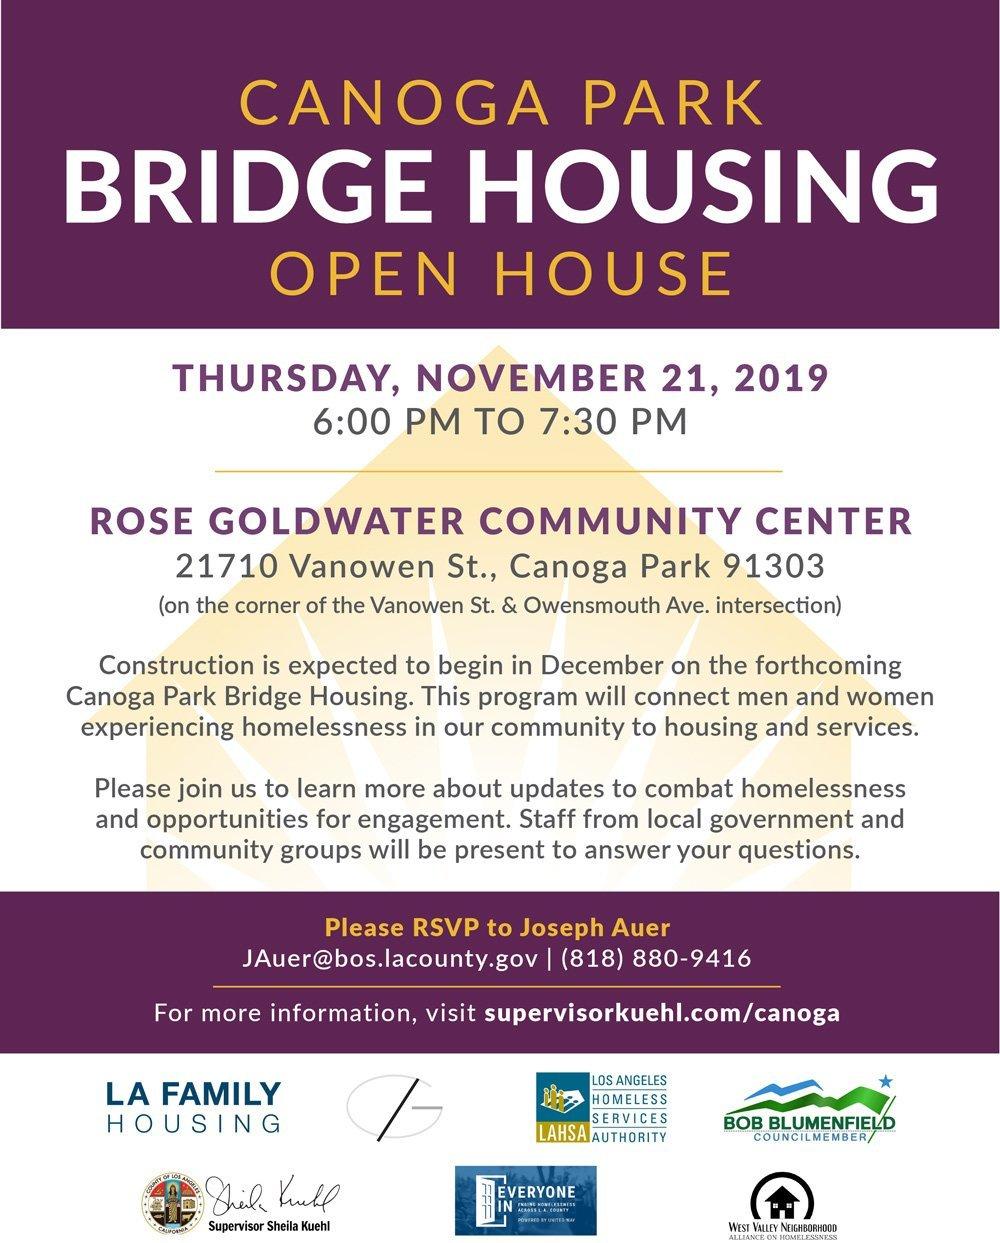 Canoga Park Bridge Housing Open House – Thursday, November 21